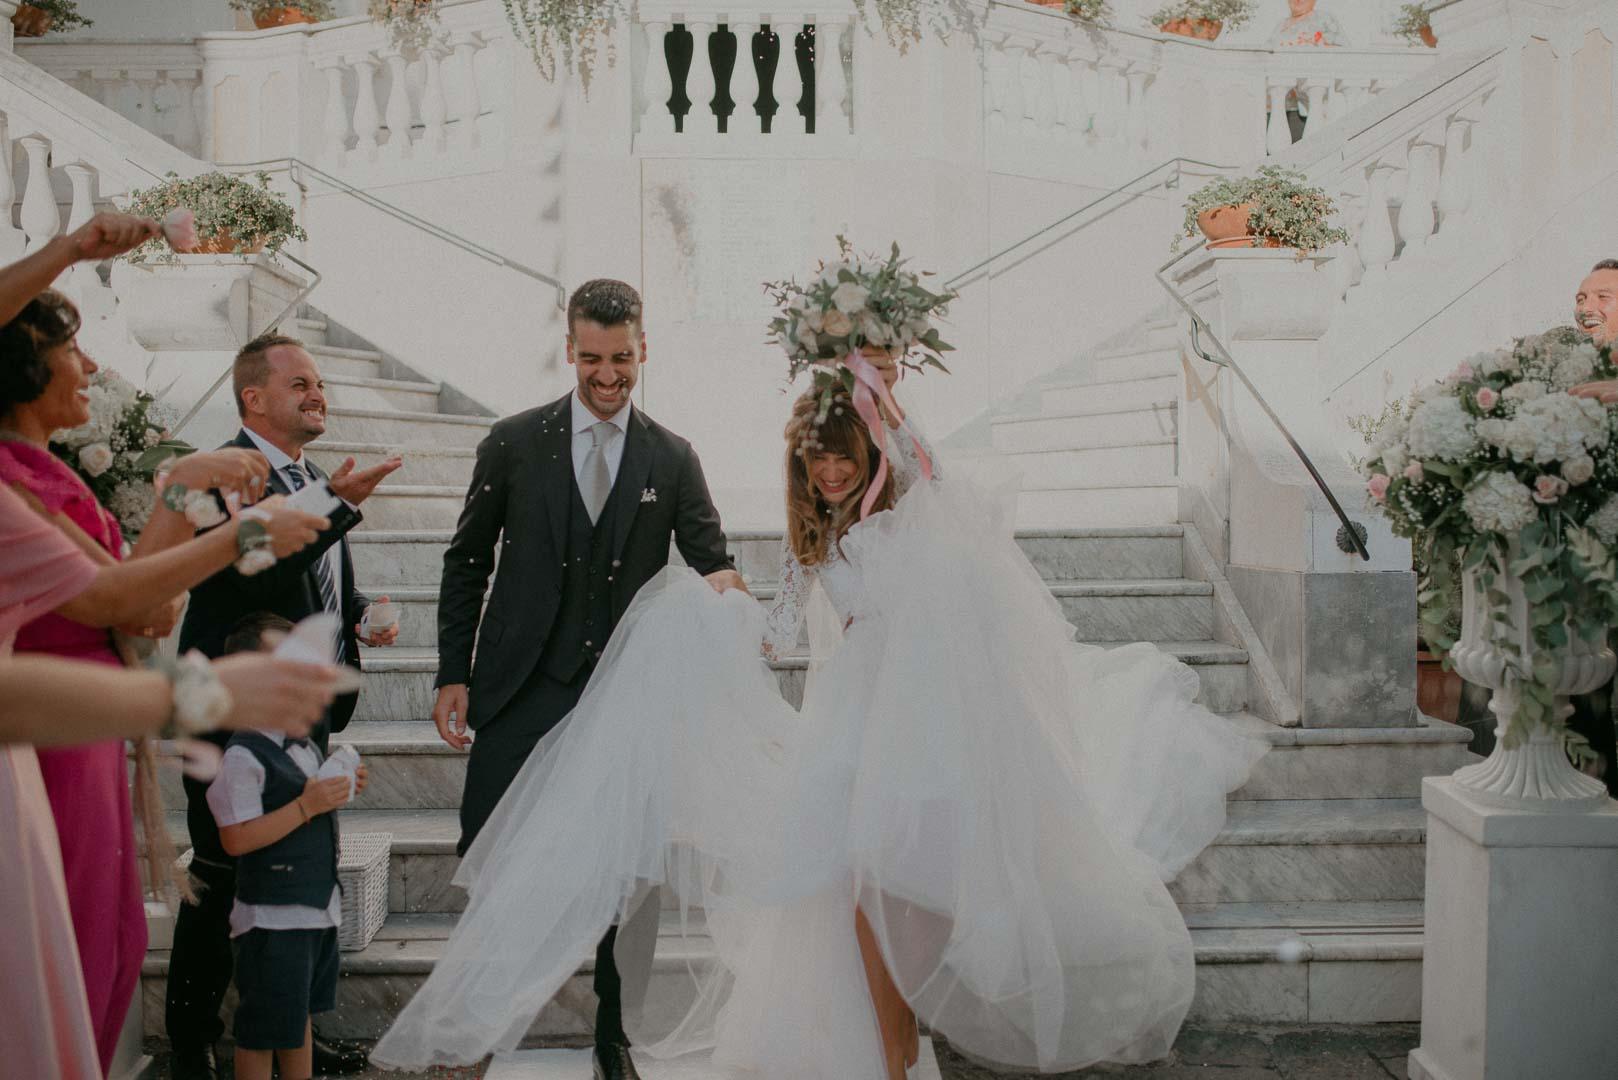 wedding-photographer-destination-fineart-bespoke-reportage-napoli-nabilah-vivianeizzo-spazio46-82